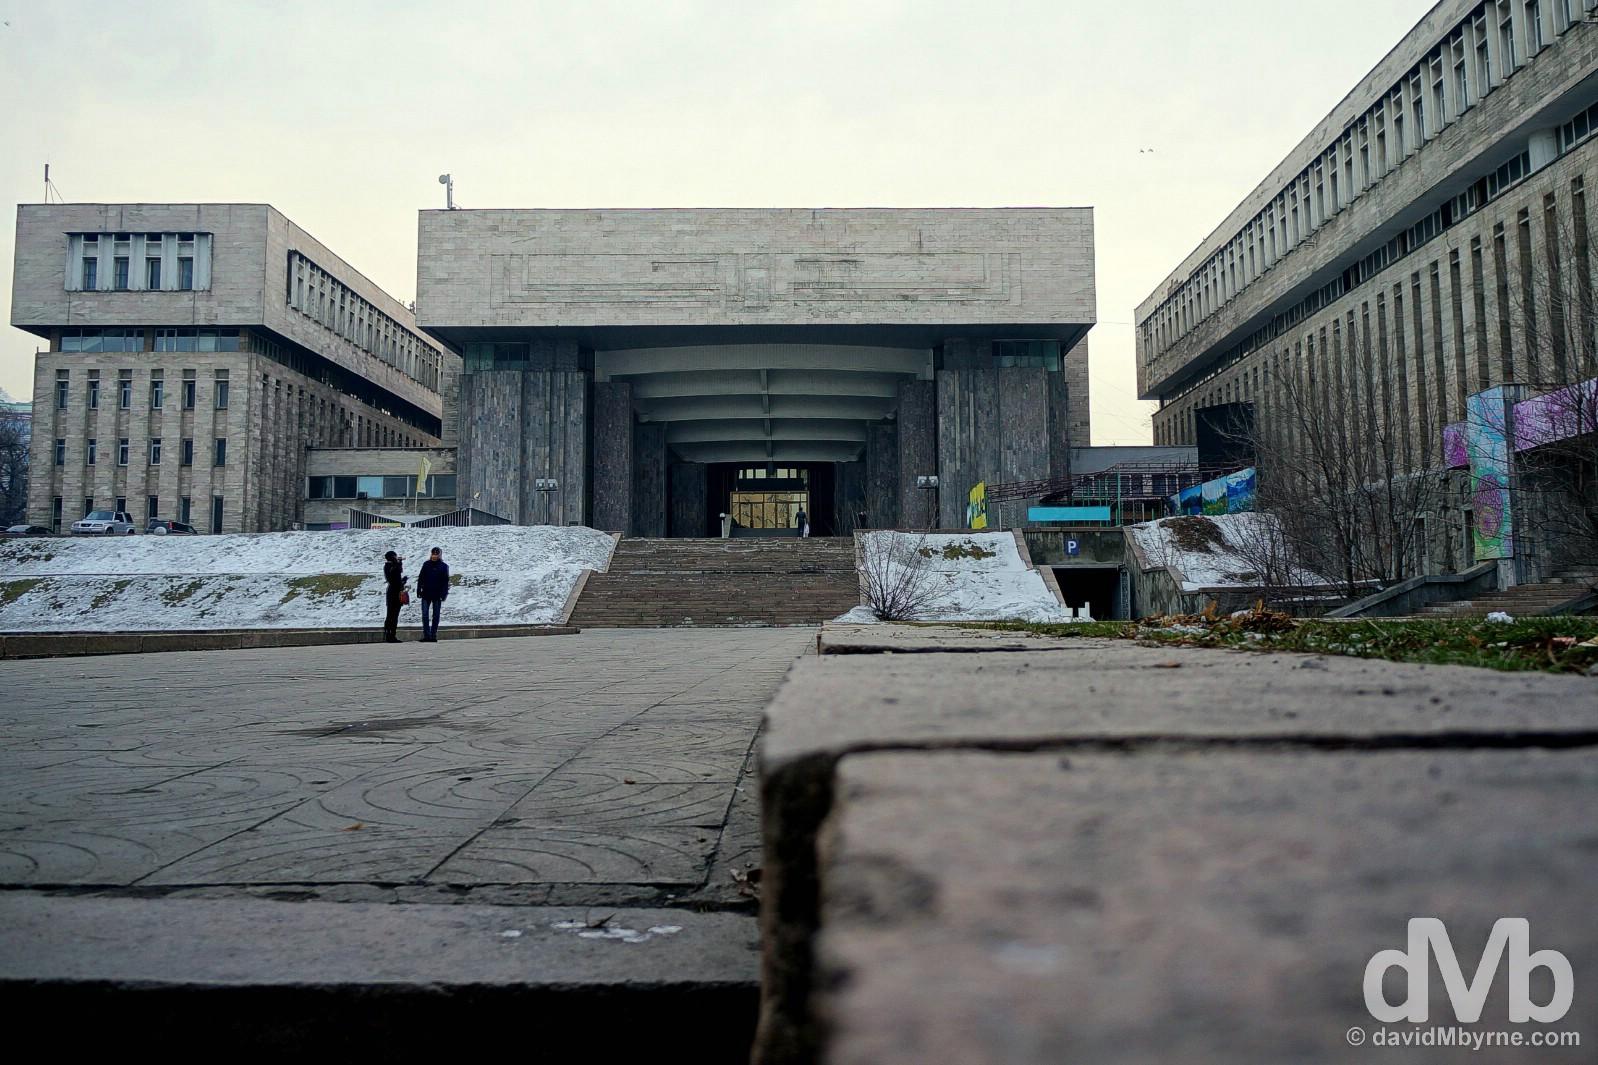 Soviet-era architecture on the streets of Almaty, Kazakhstan. February 14, 2015.